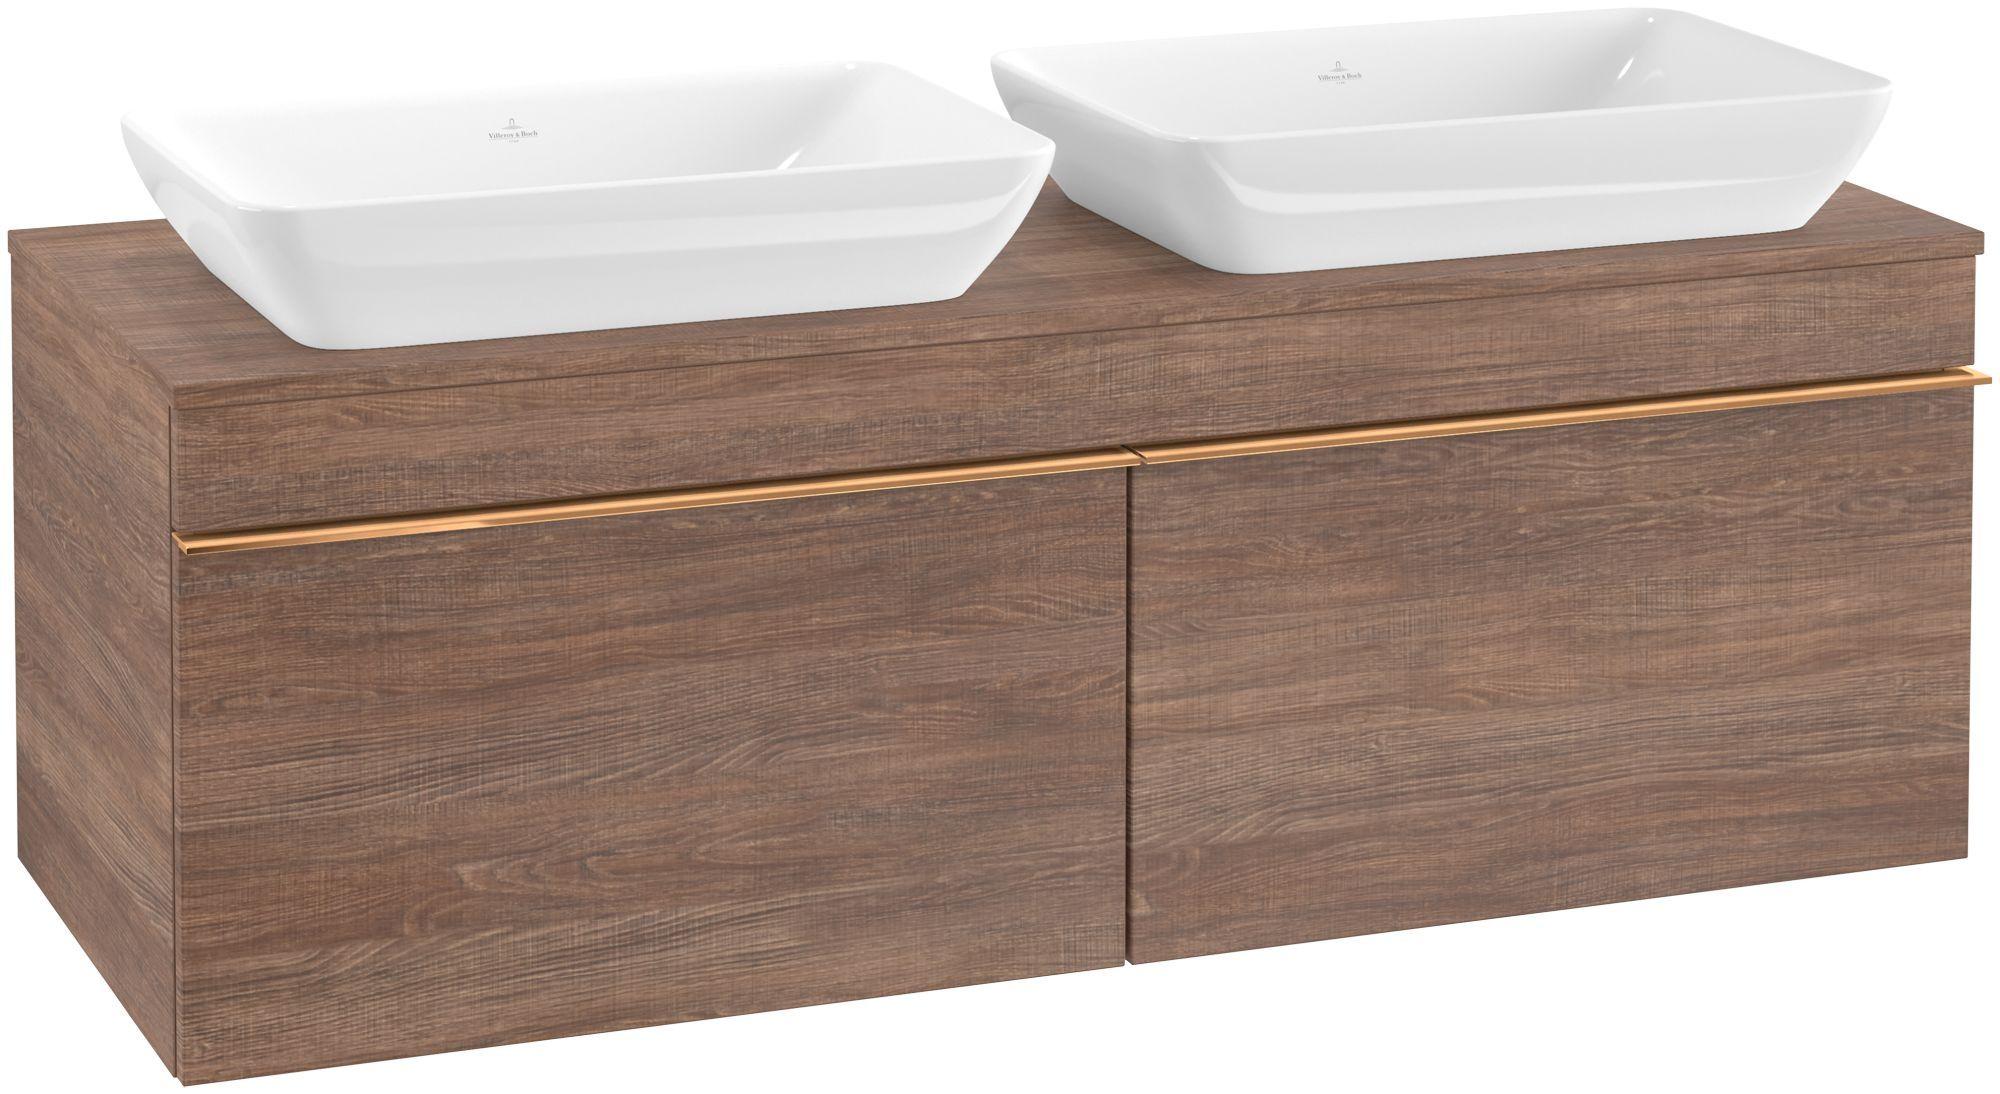 Villeroy & Boch Venticello Waschtischunterschrank für 2 Waschtische 2 Auszüge B:125,7xH:43,6xT:50,2cm santana oak Griffe copper A94905E1